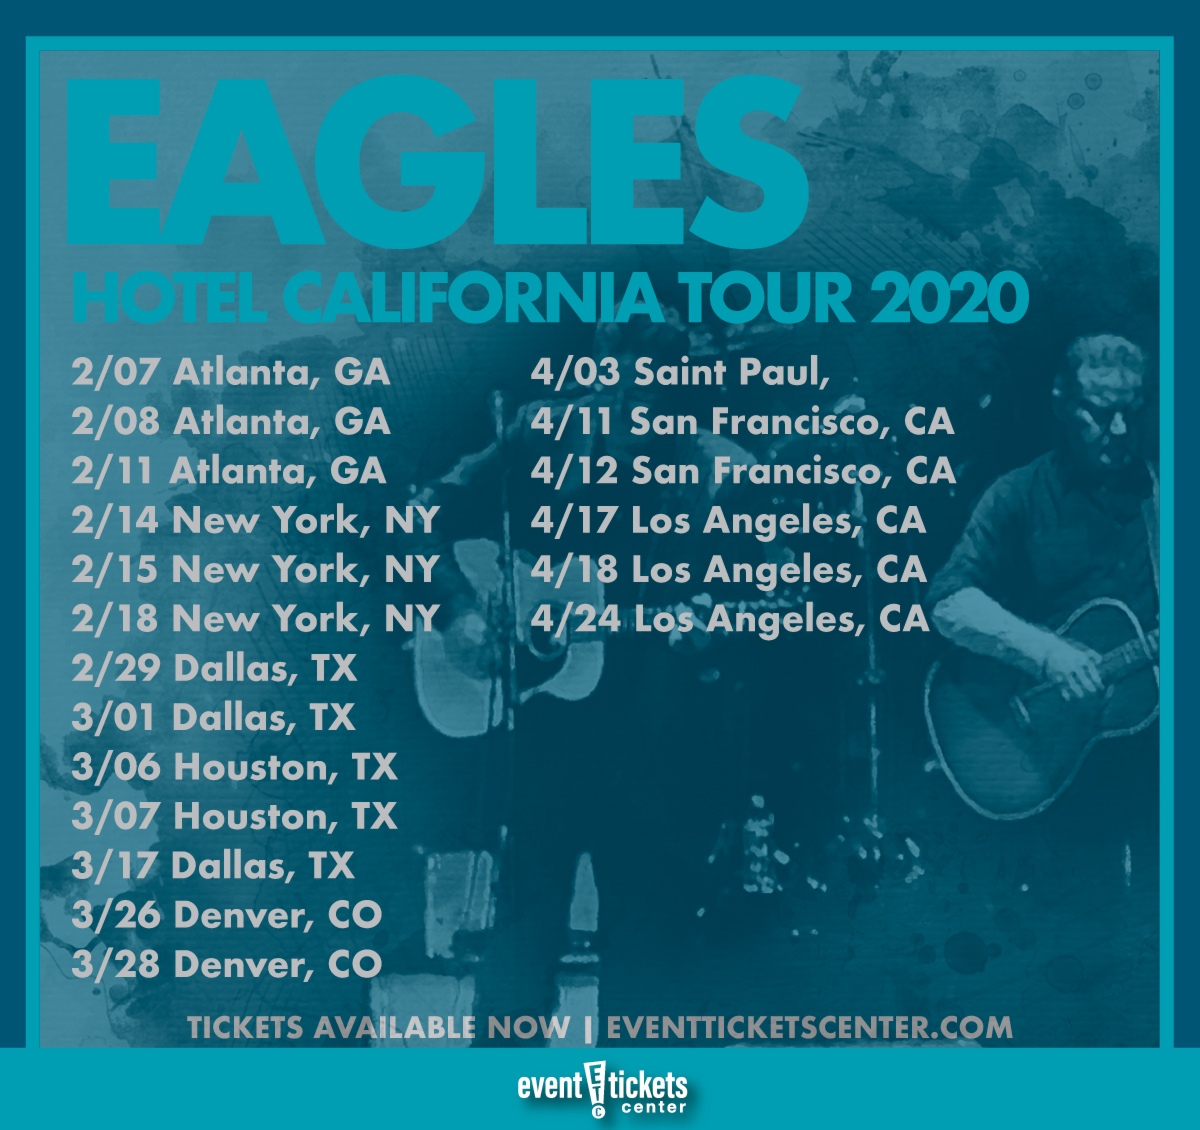 Eagles Tour 2020.Eagles Expand 2020 Hotel California Tour